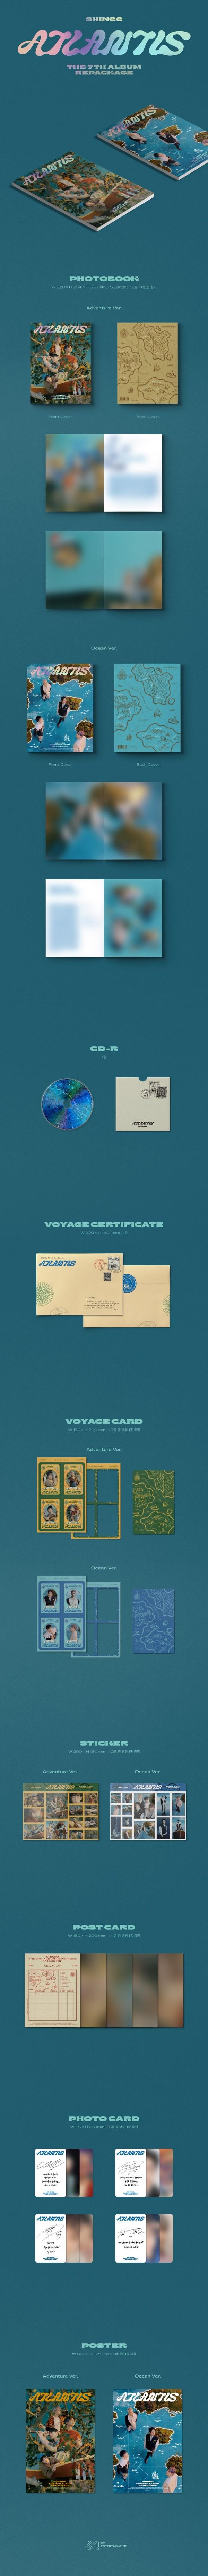 SHINee|韓国リパッケージアルバム『Atlantis』|